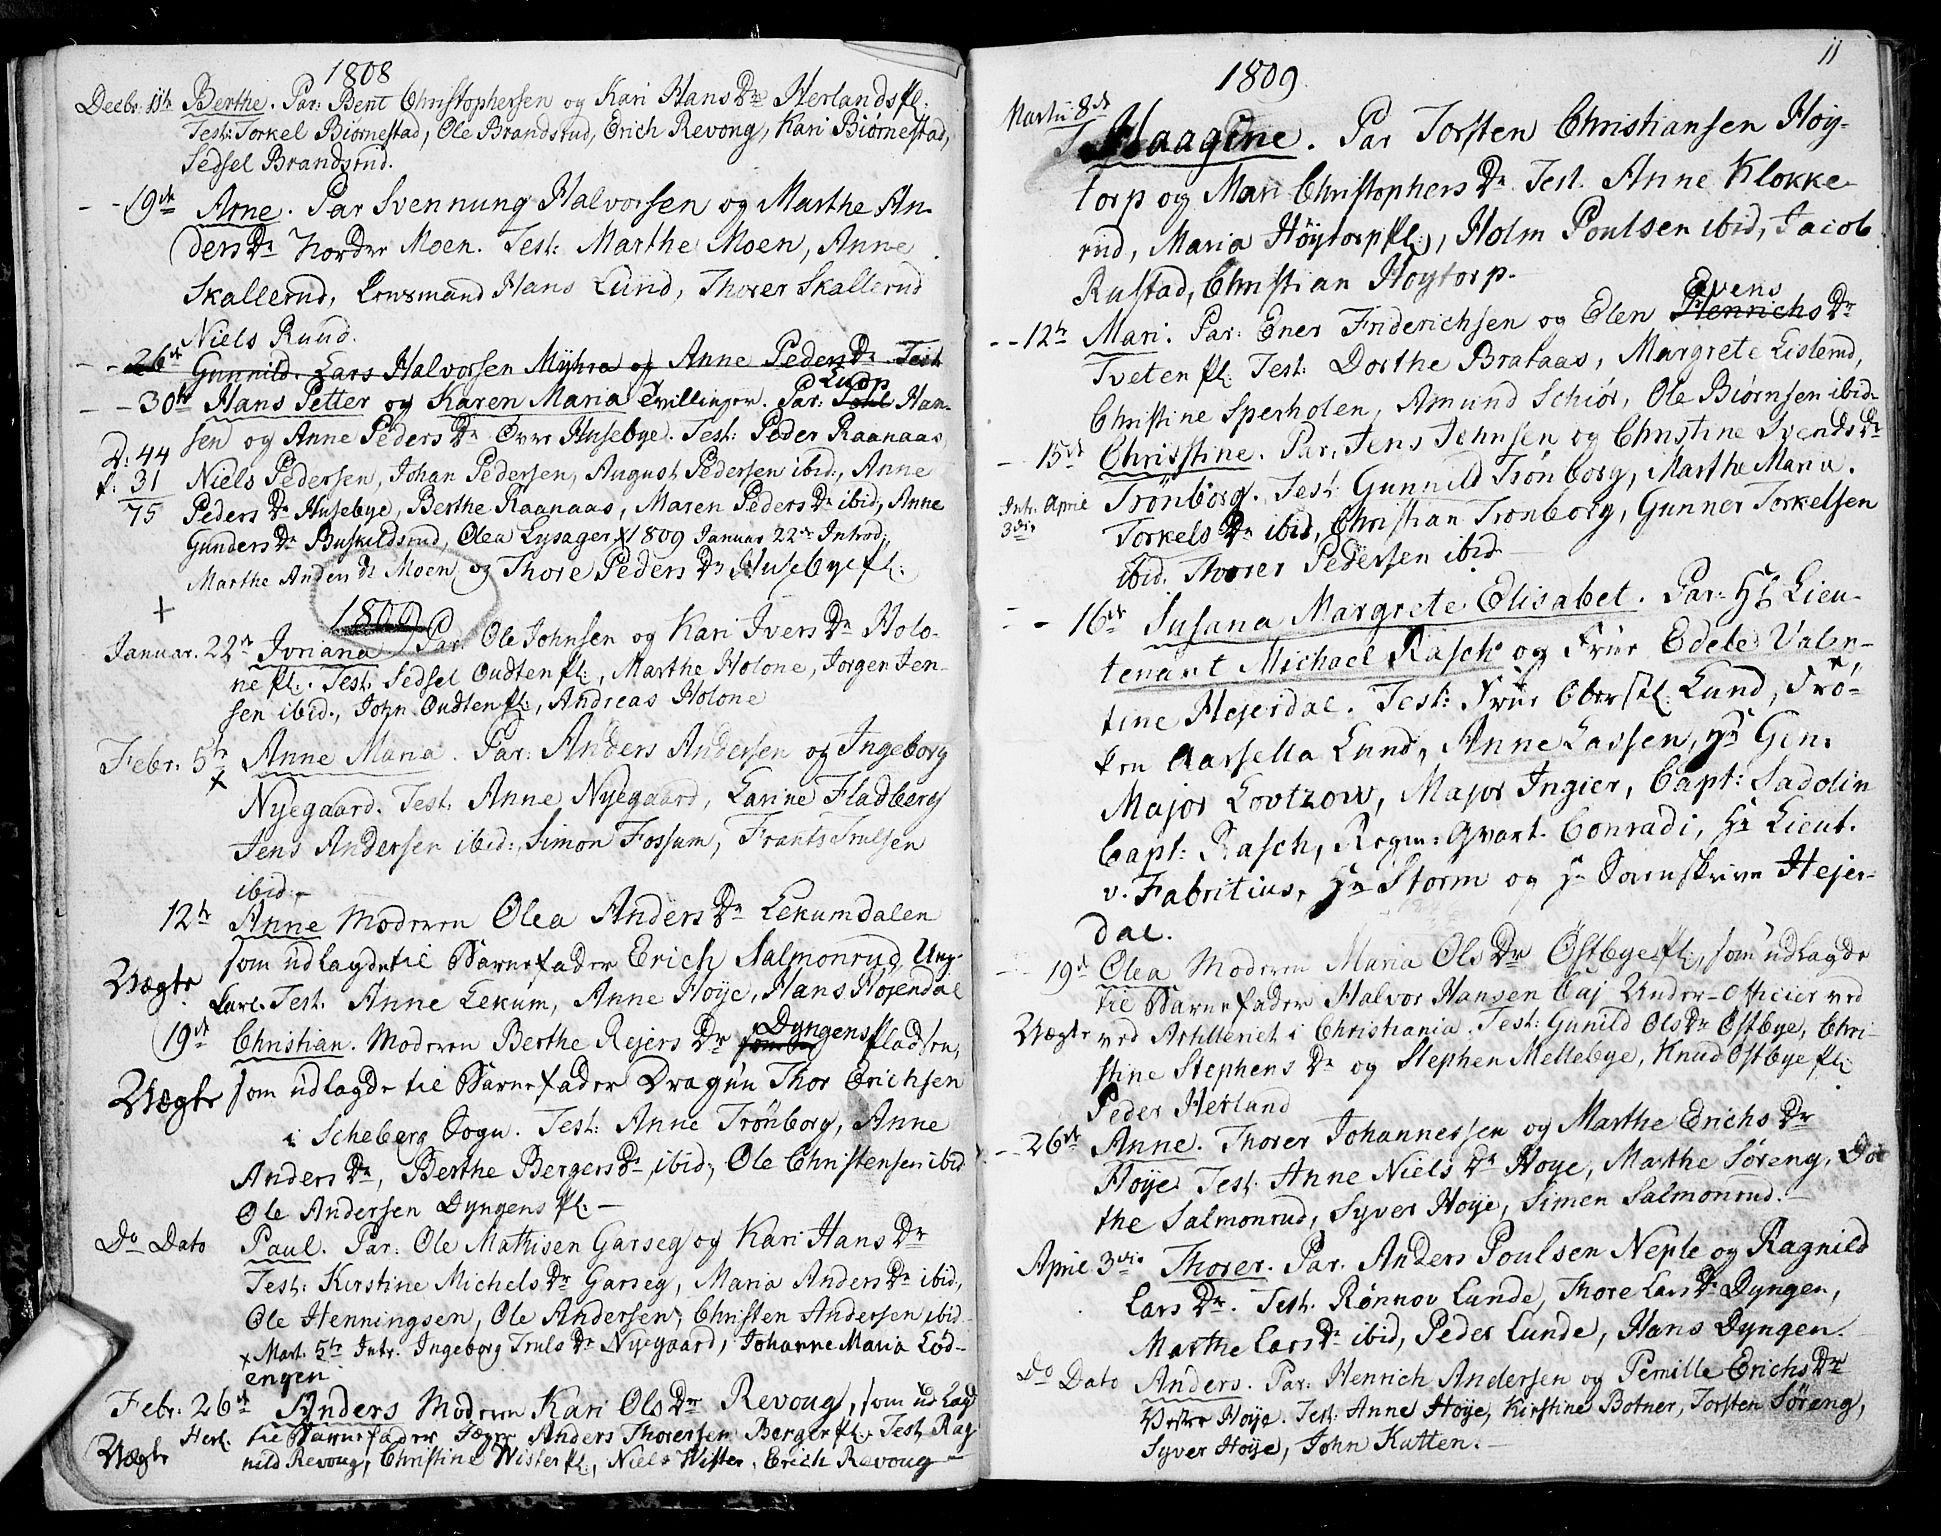 SAO, Eidsberg prestekontor Kirkebøker, F/Fa/L0006: Ministerialbok nr. I 6, 1807-1814, s. 11